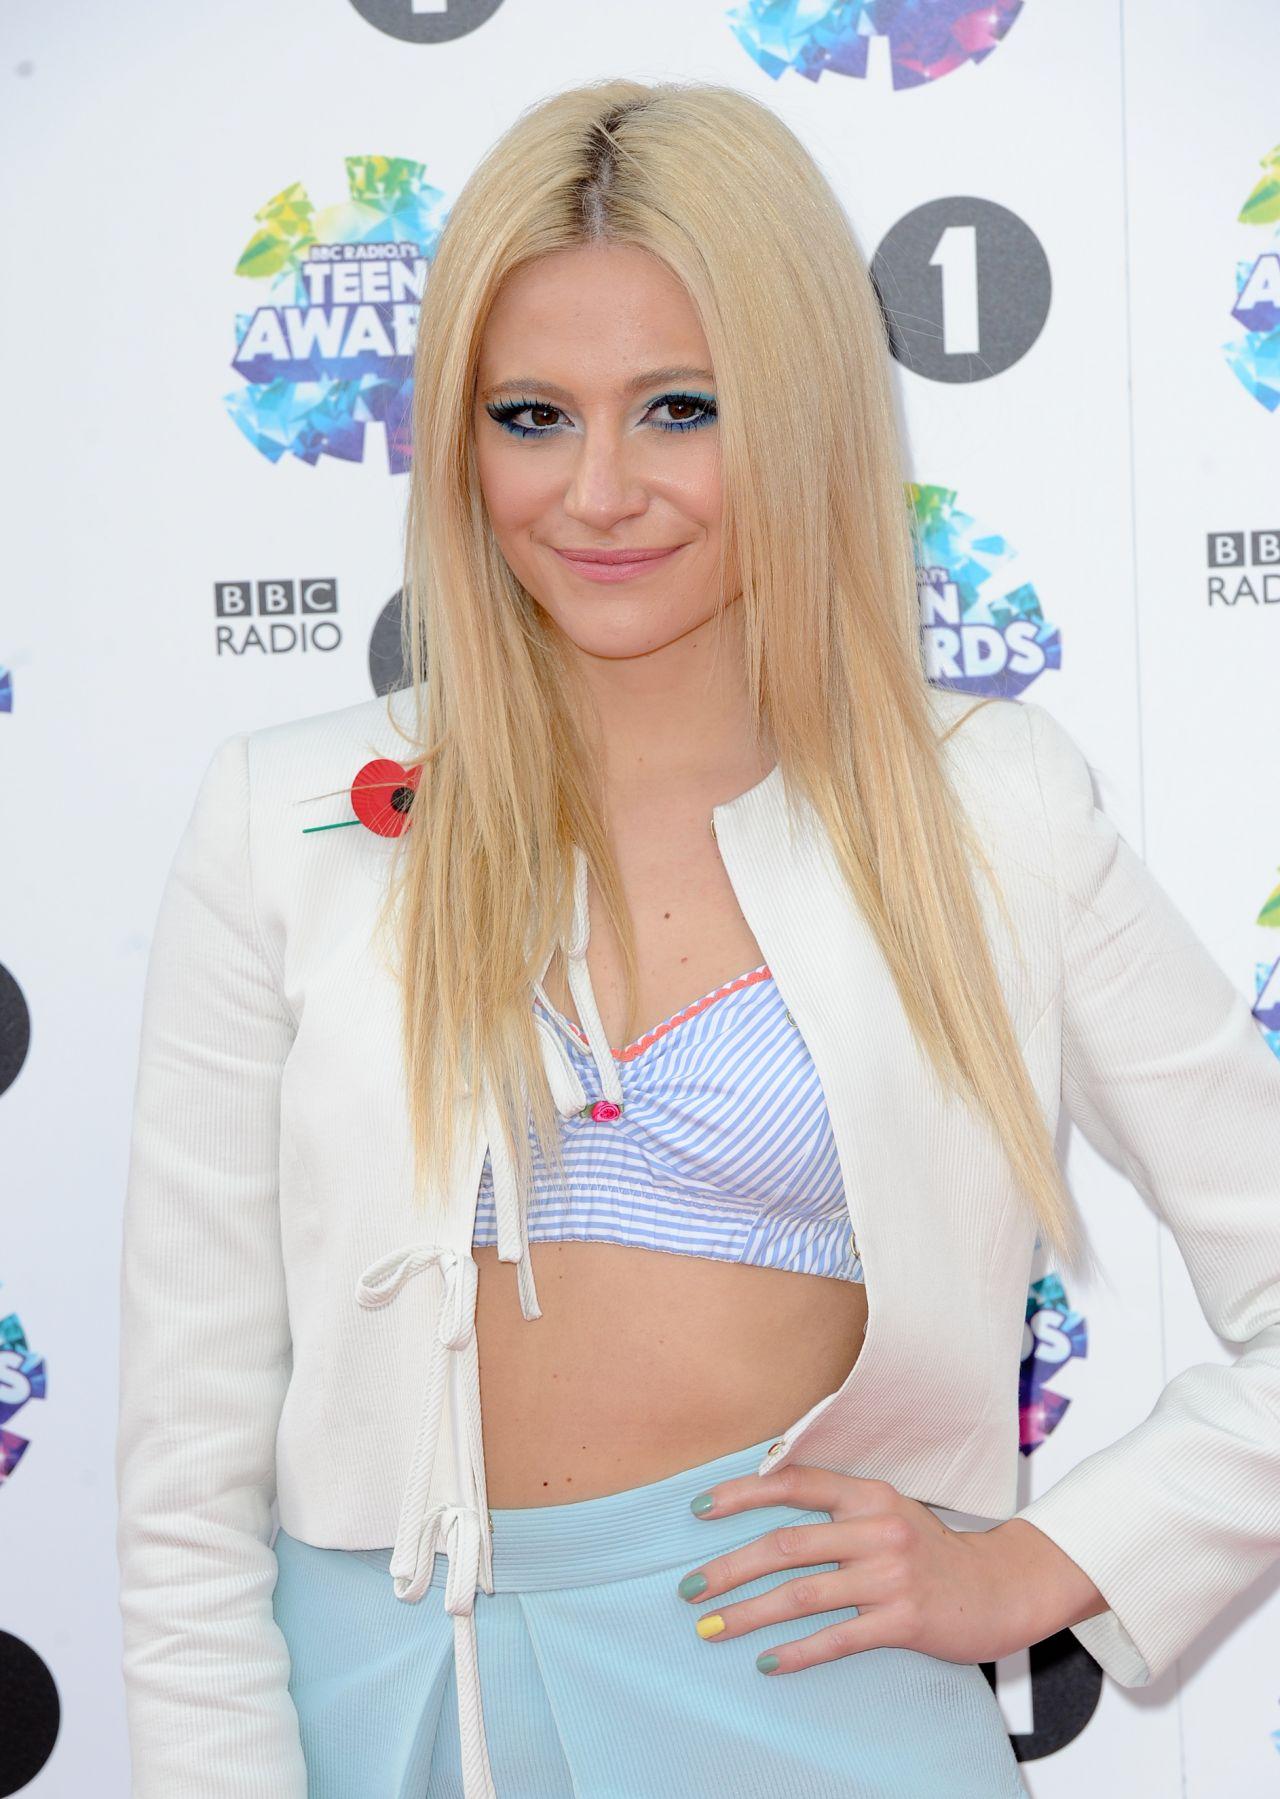 Pixie Lott on Red Carpet - BBC Radio 1 Teen Awards in London